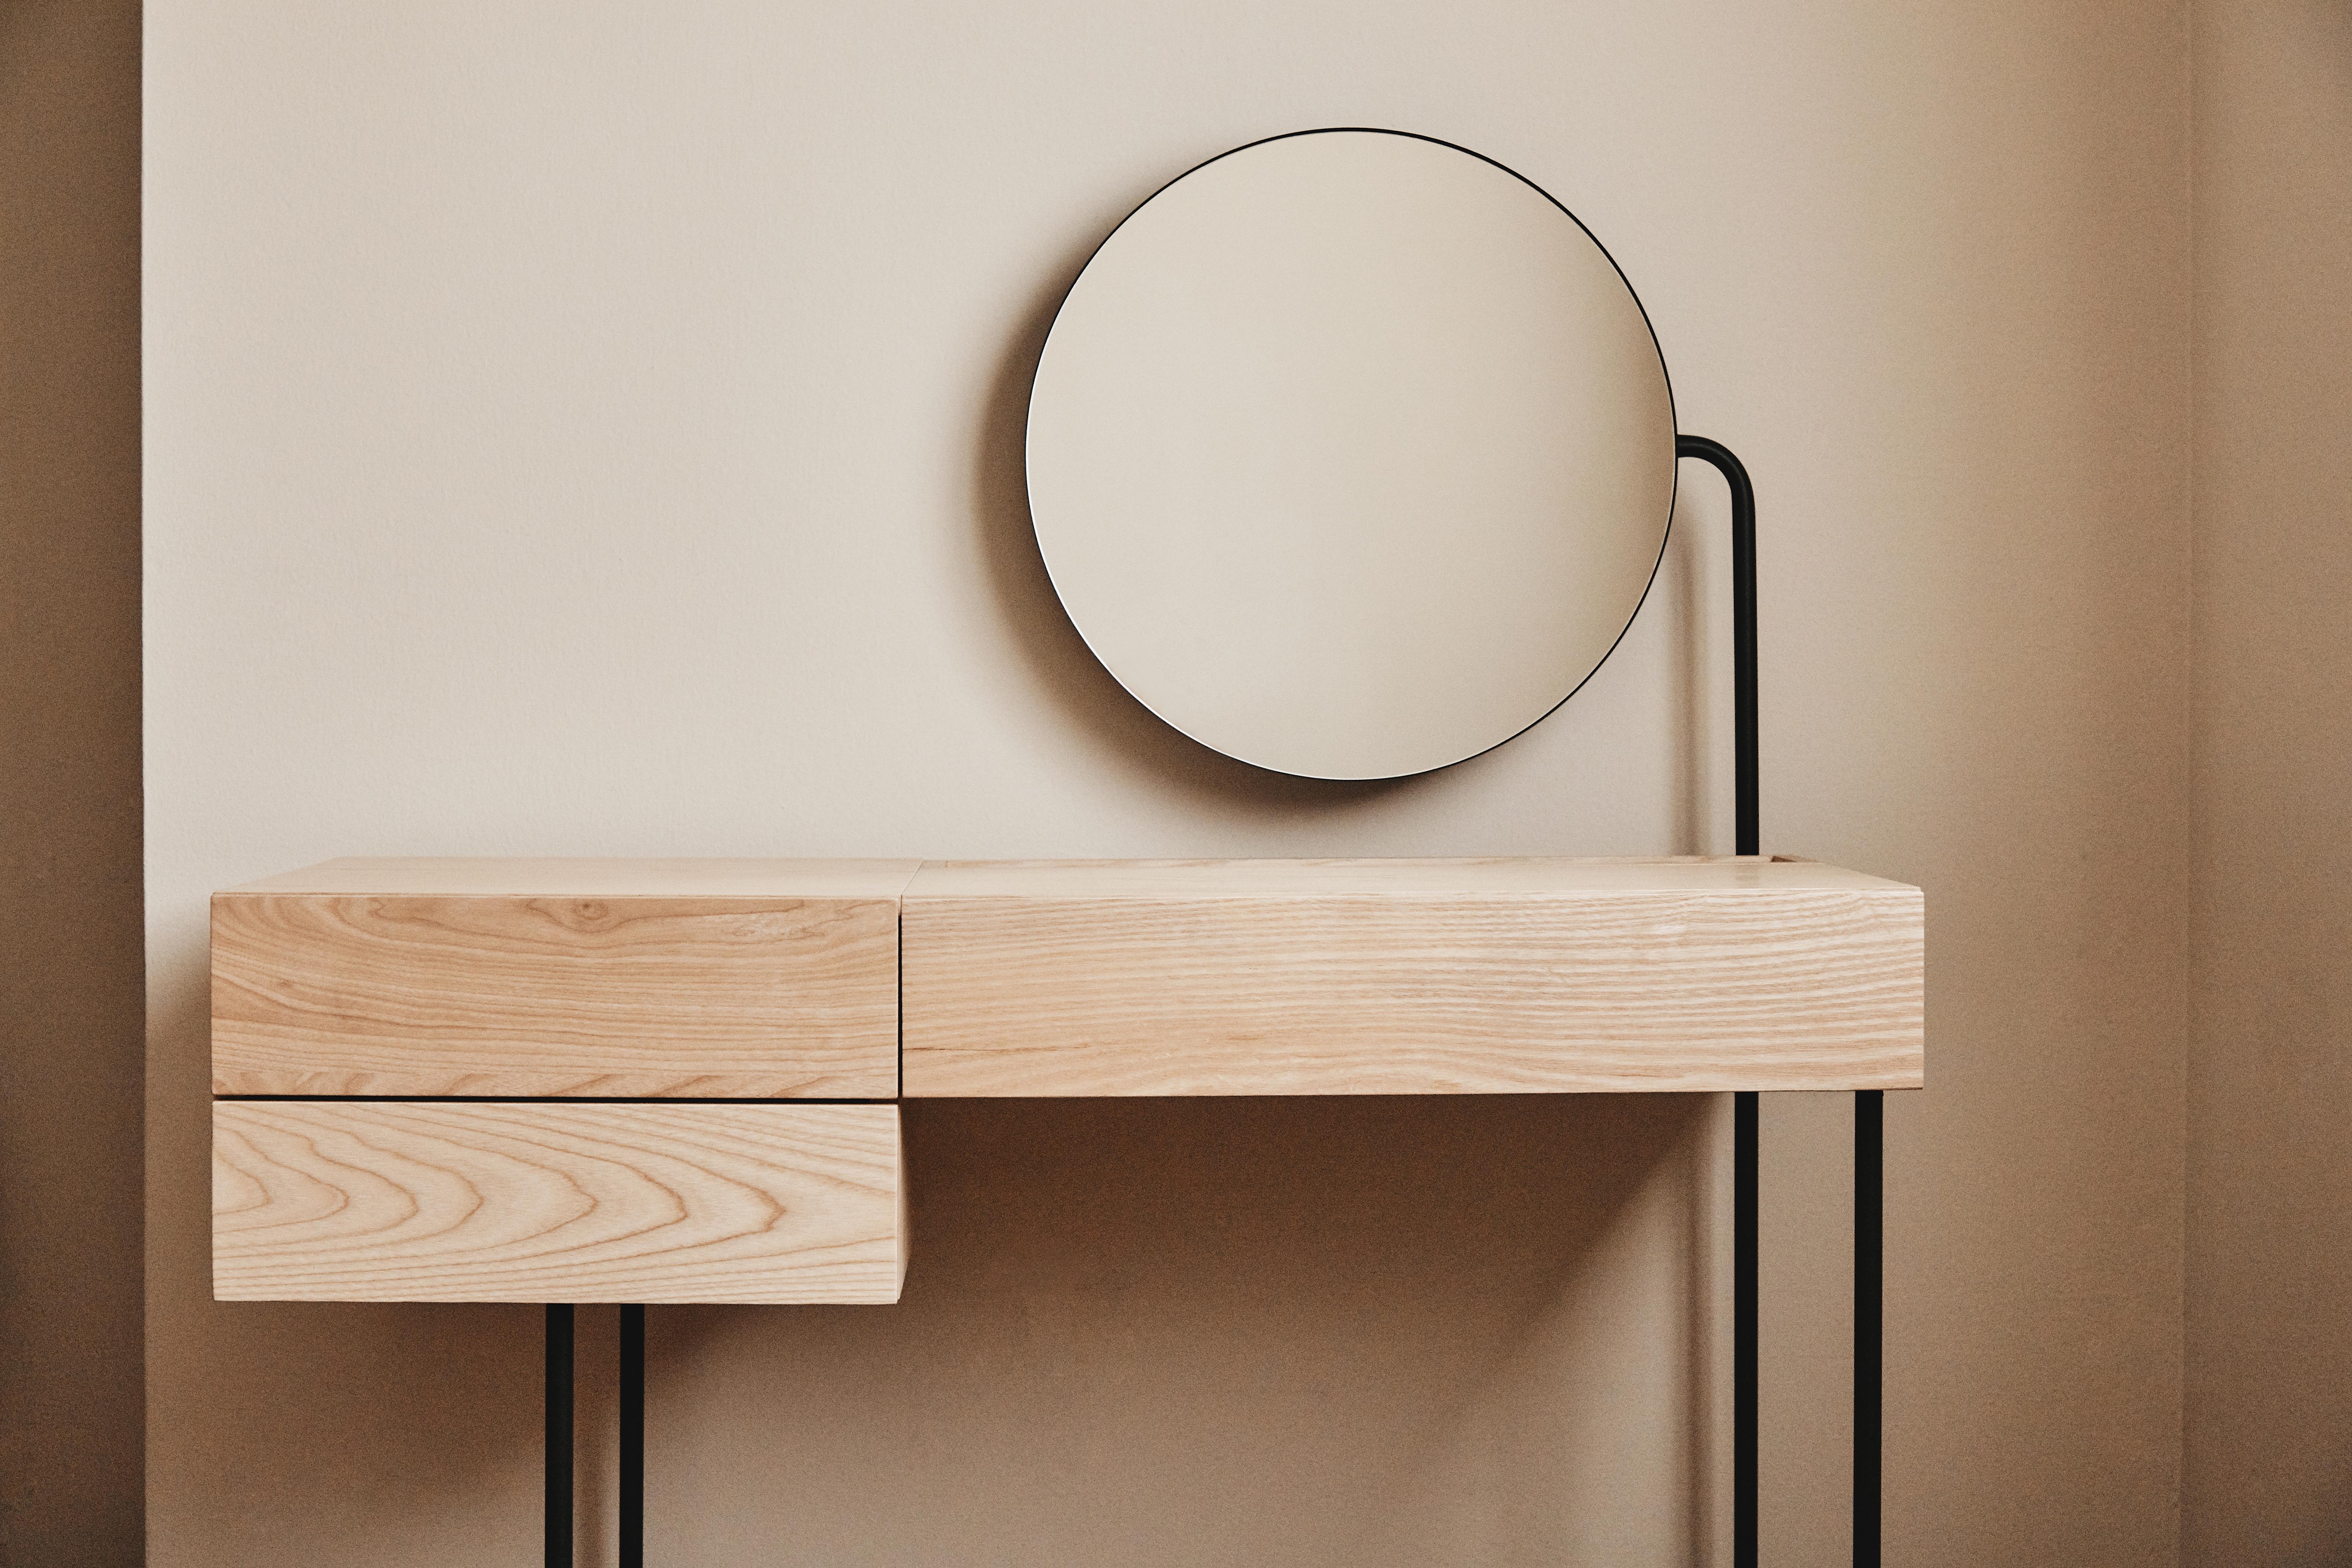 A natural wood desk with a circular mirror.